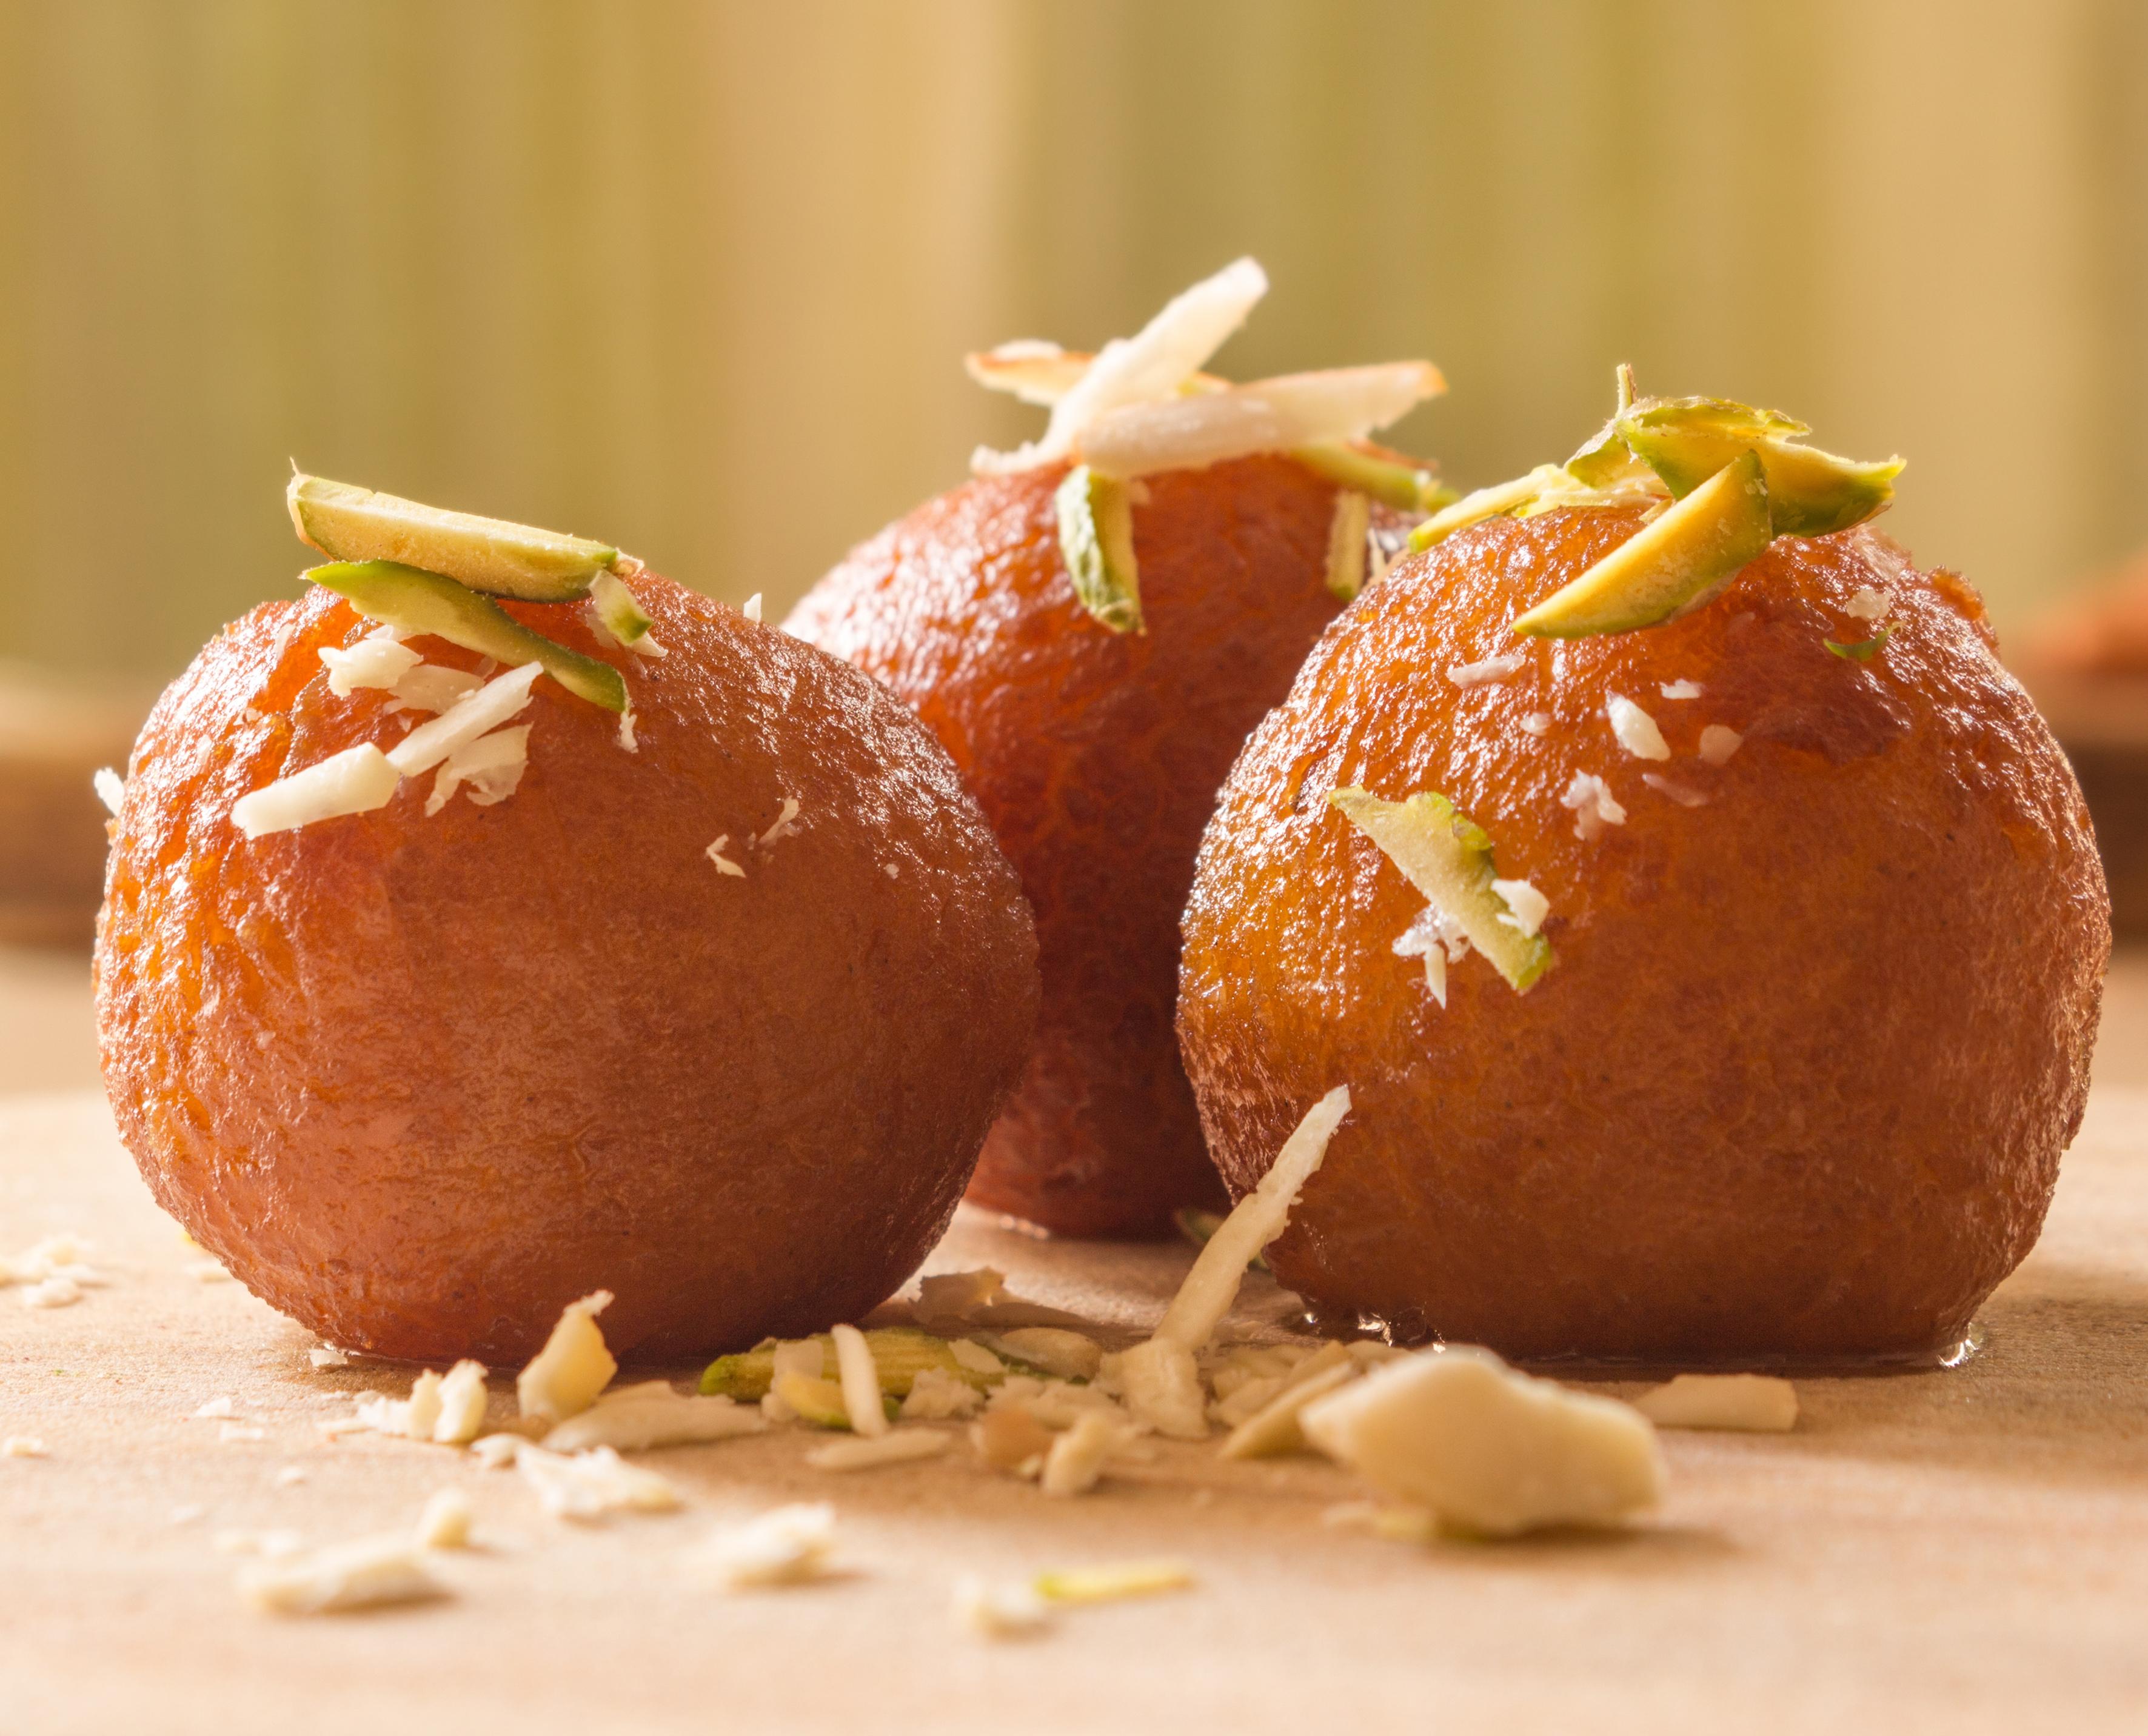 Oman dining: Don't let your leftover go waste